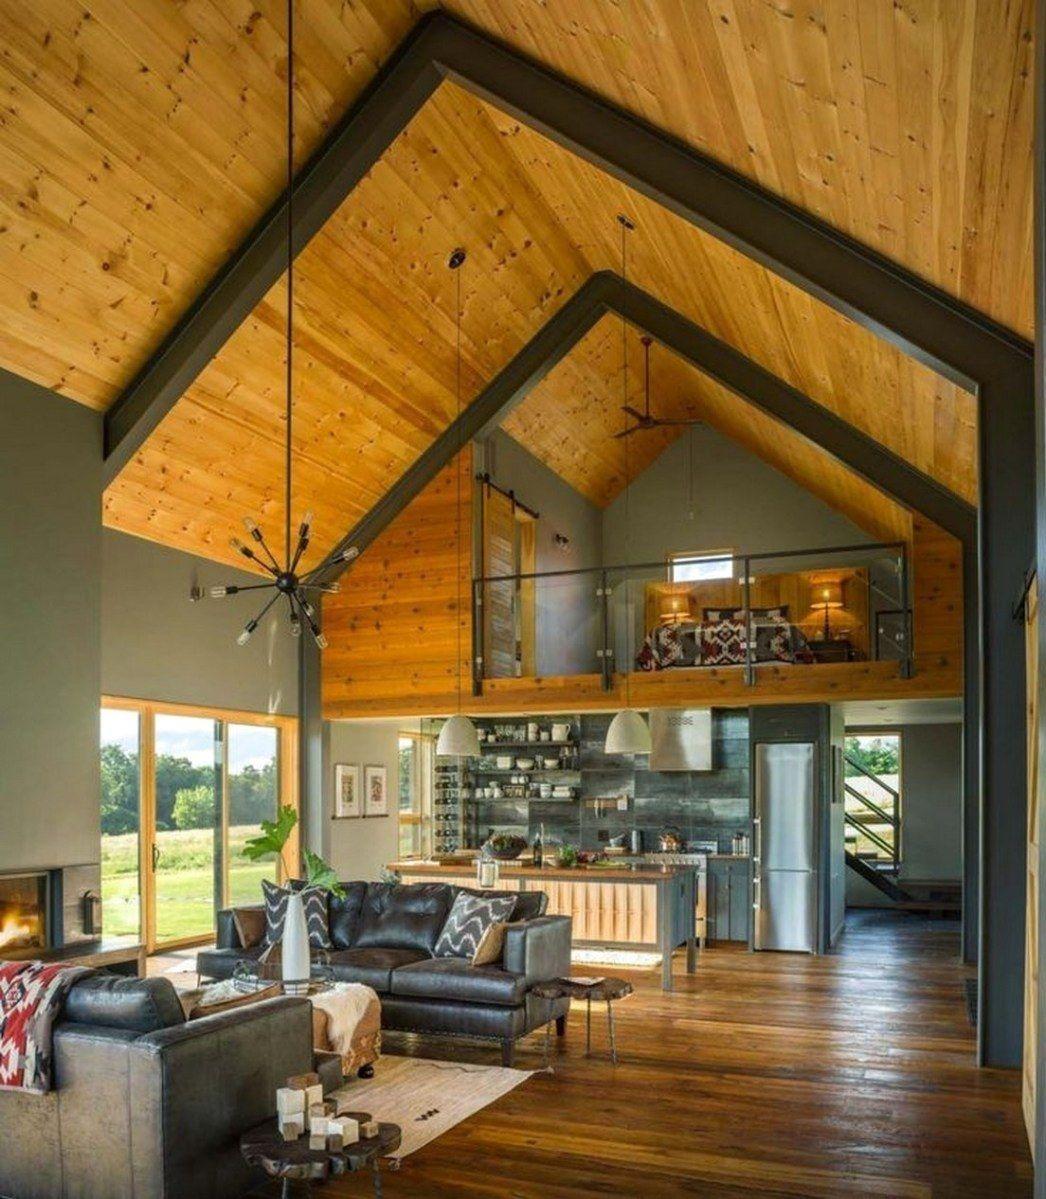 Good Home Design Ideas: 50 Best Tiny House Design Ideas